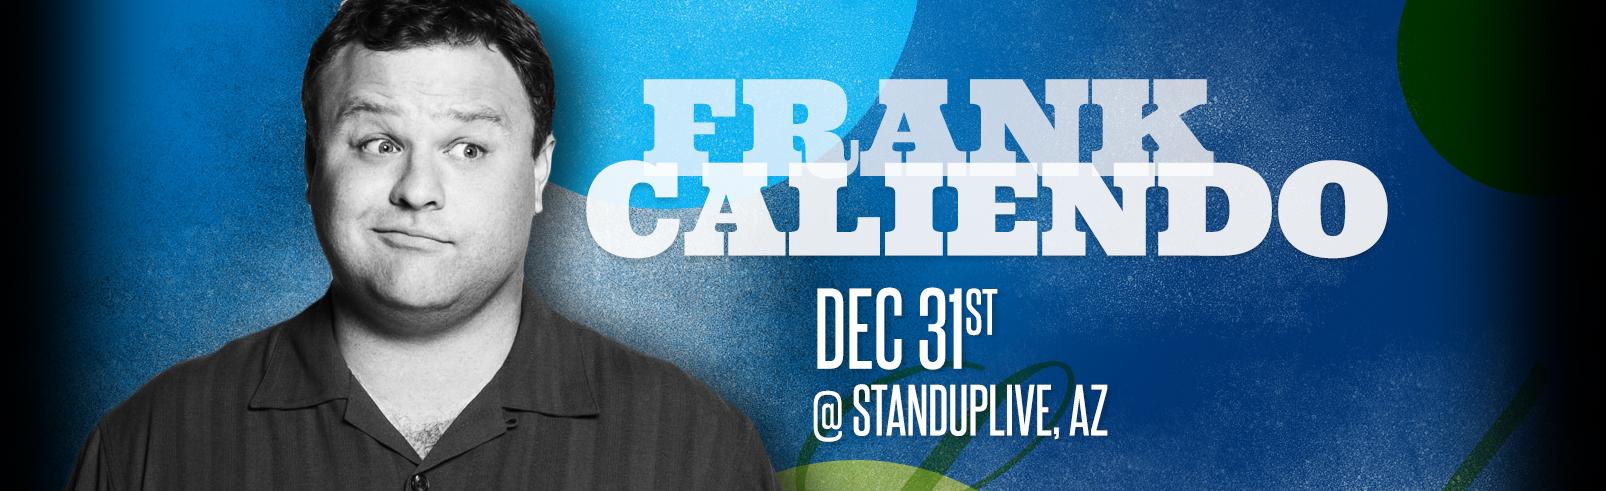 Frank Caliendo @ StandUpLive